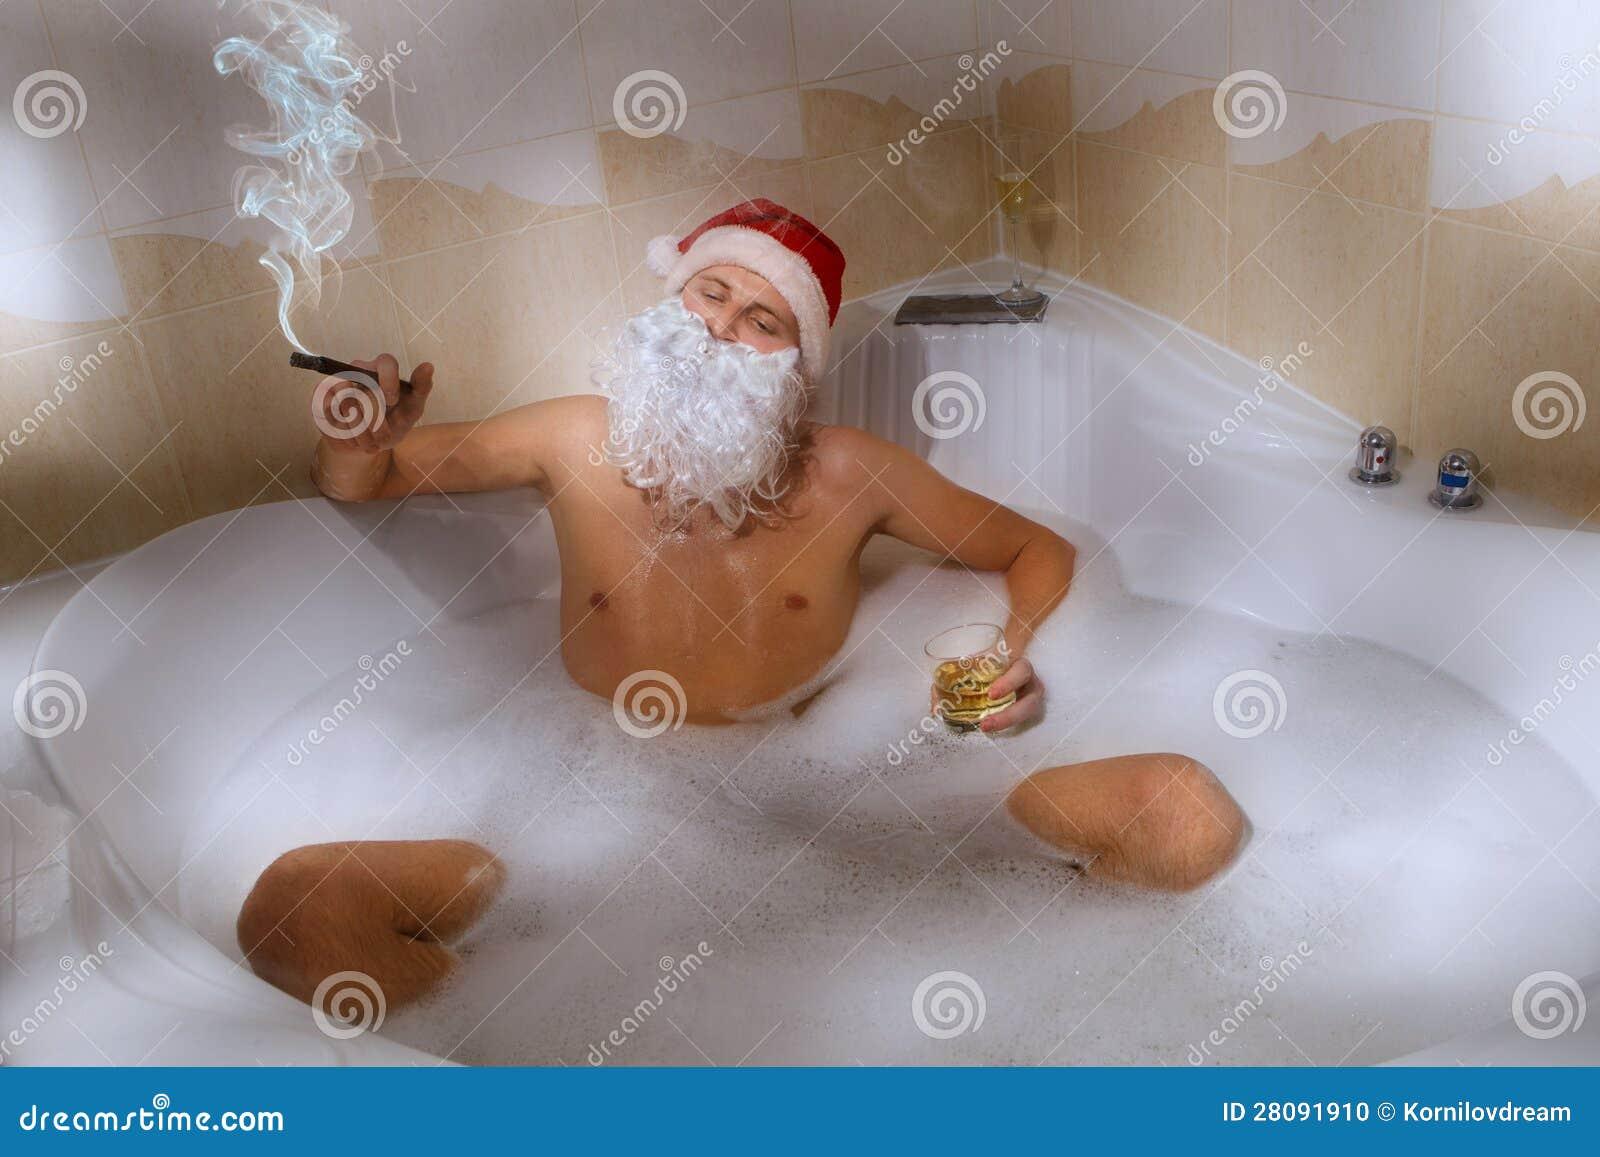 28 santa in a bathtub yule love this a box of bubble bars f